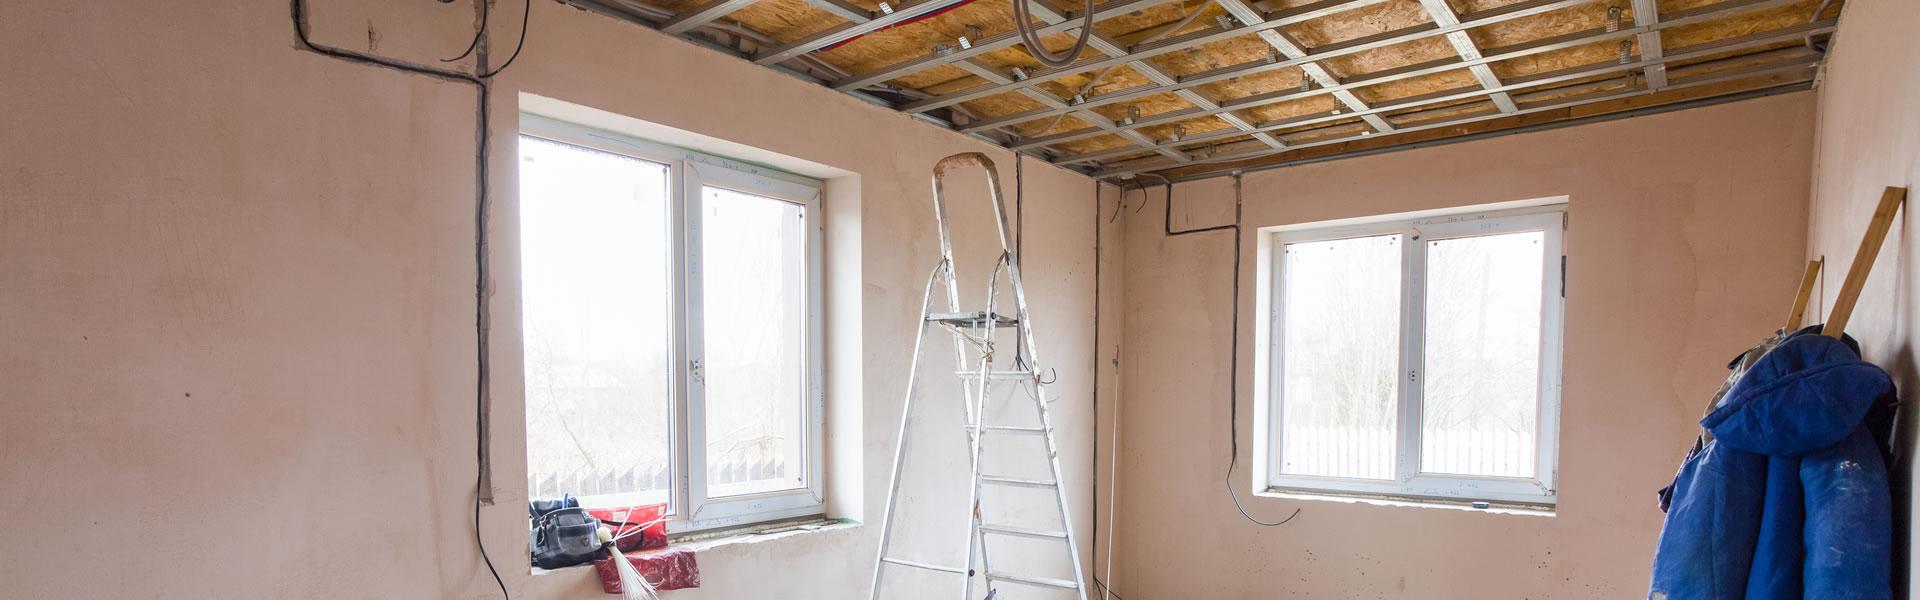 cee un outil d aide la r novation nerg tique. Black Bedroom Furniture Sets. Home Design Ideas